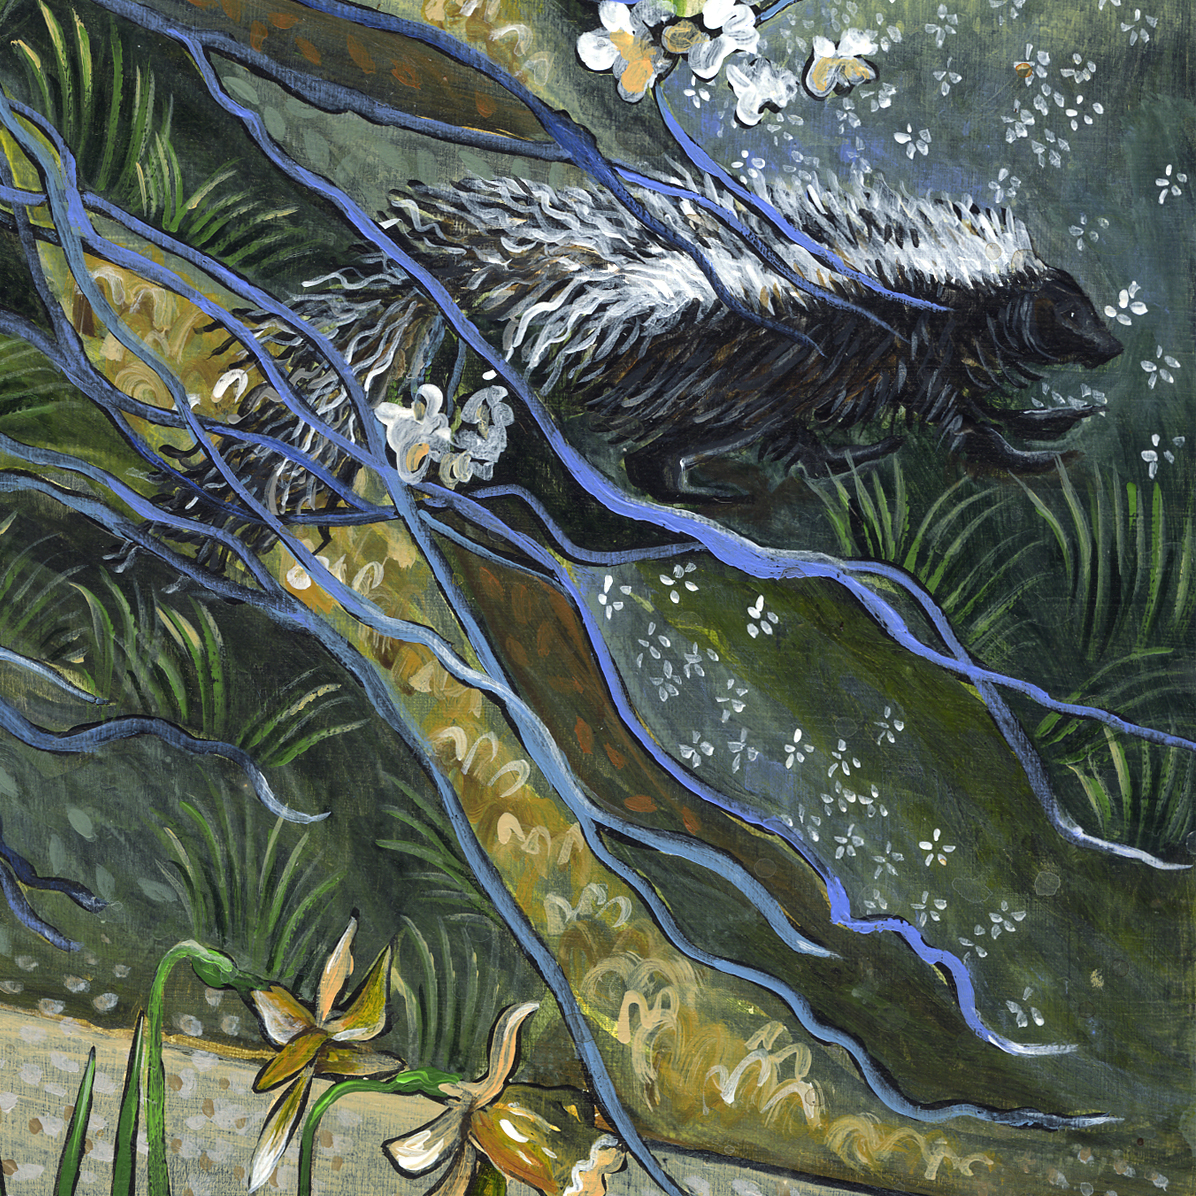 """Peaceable Kingdom. The Animals"" detail."